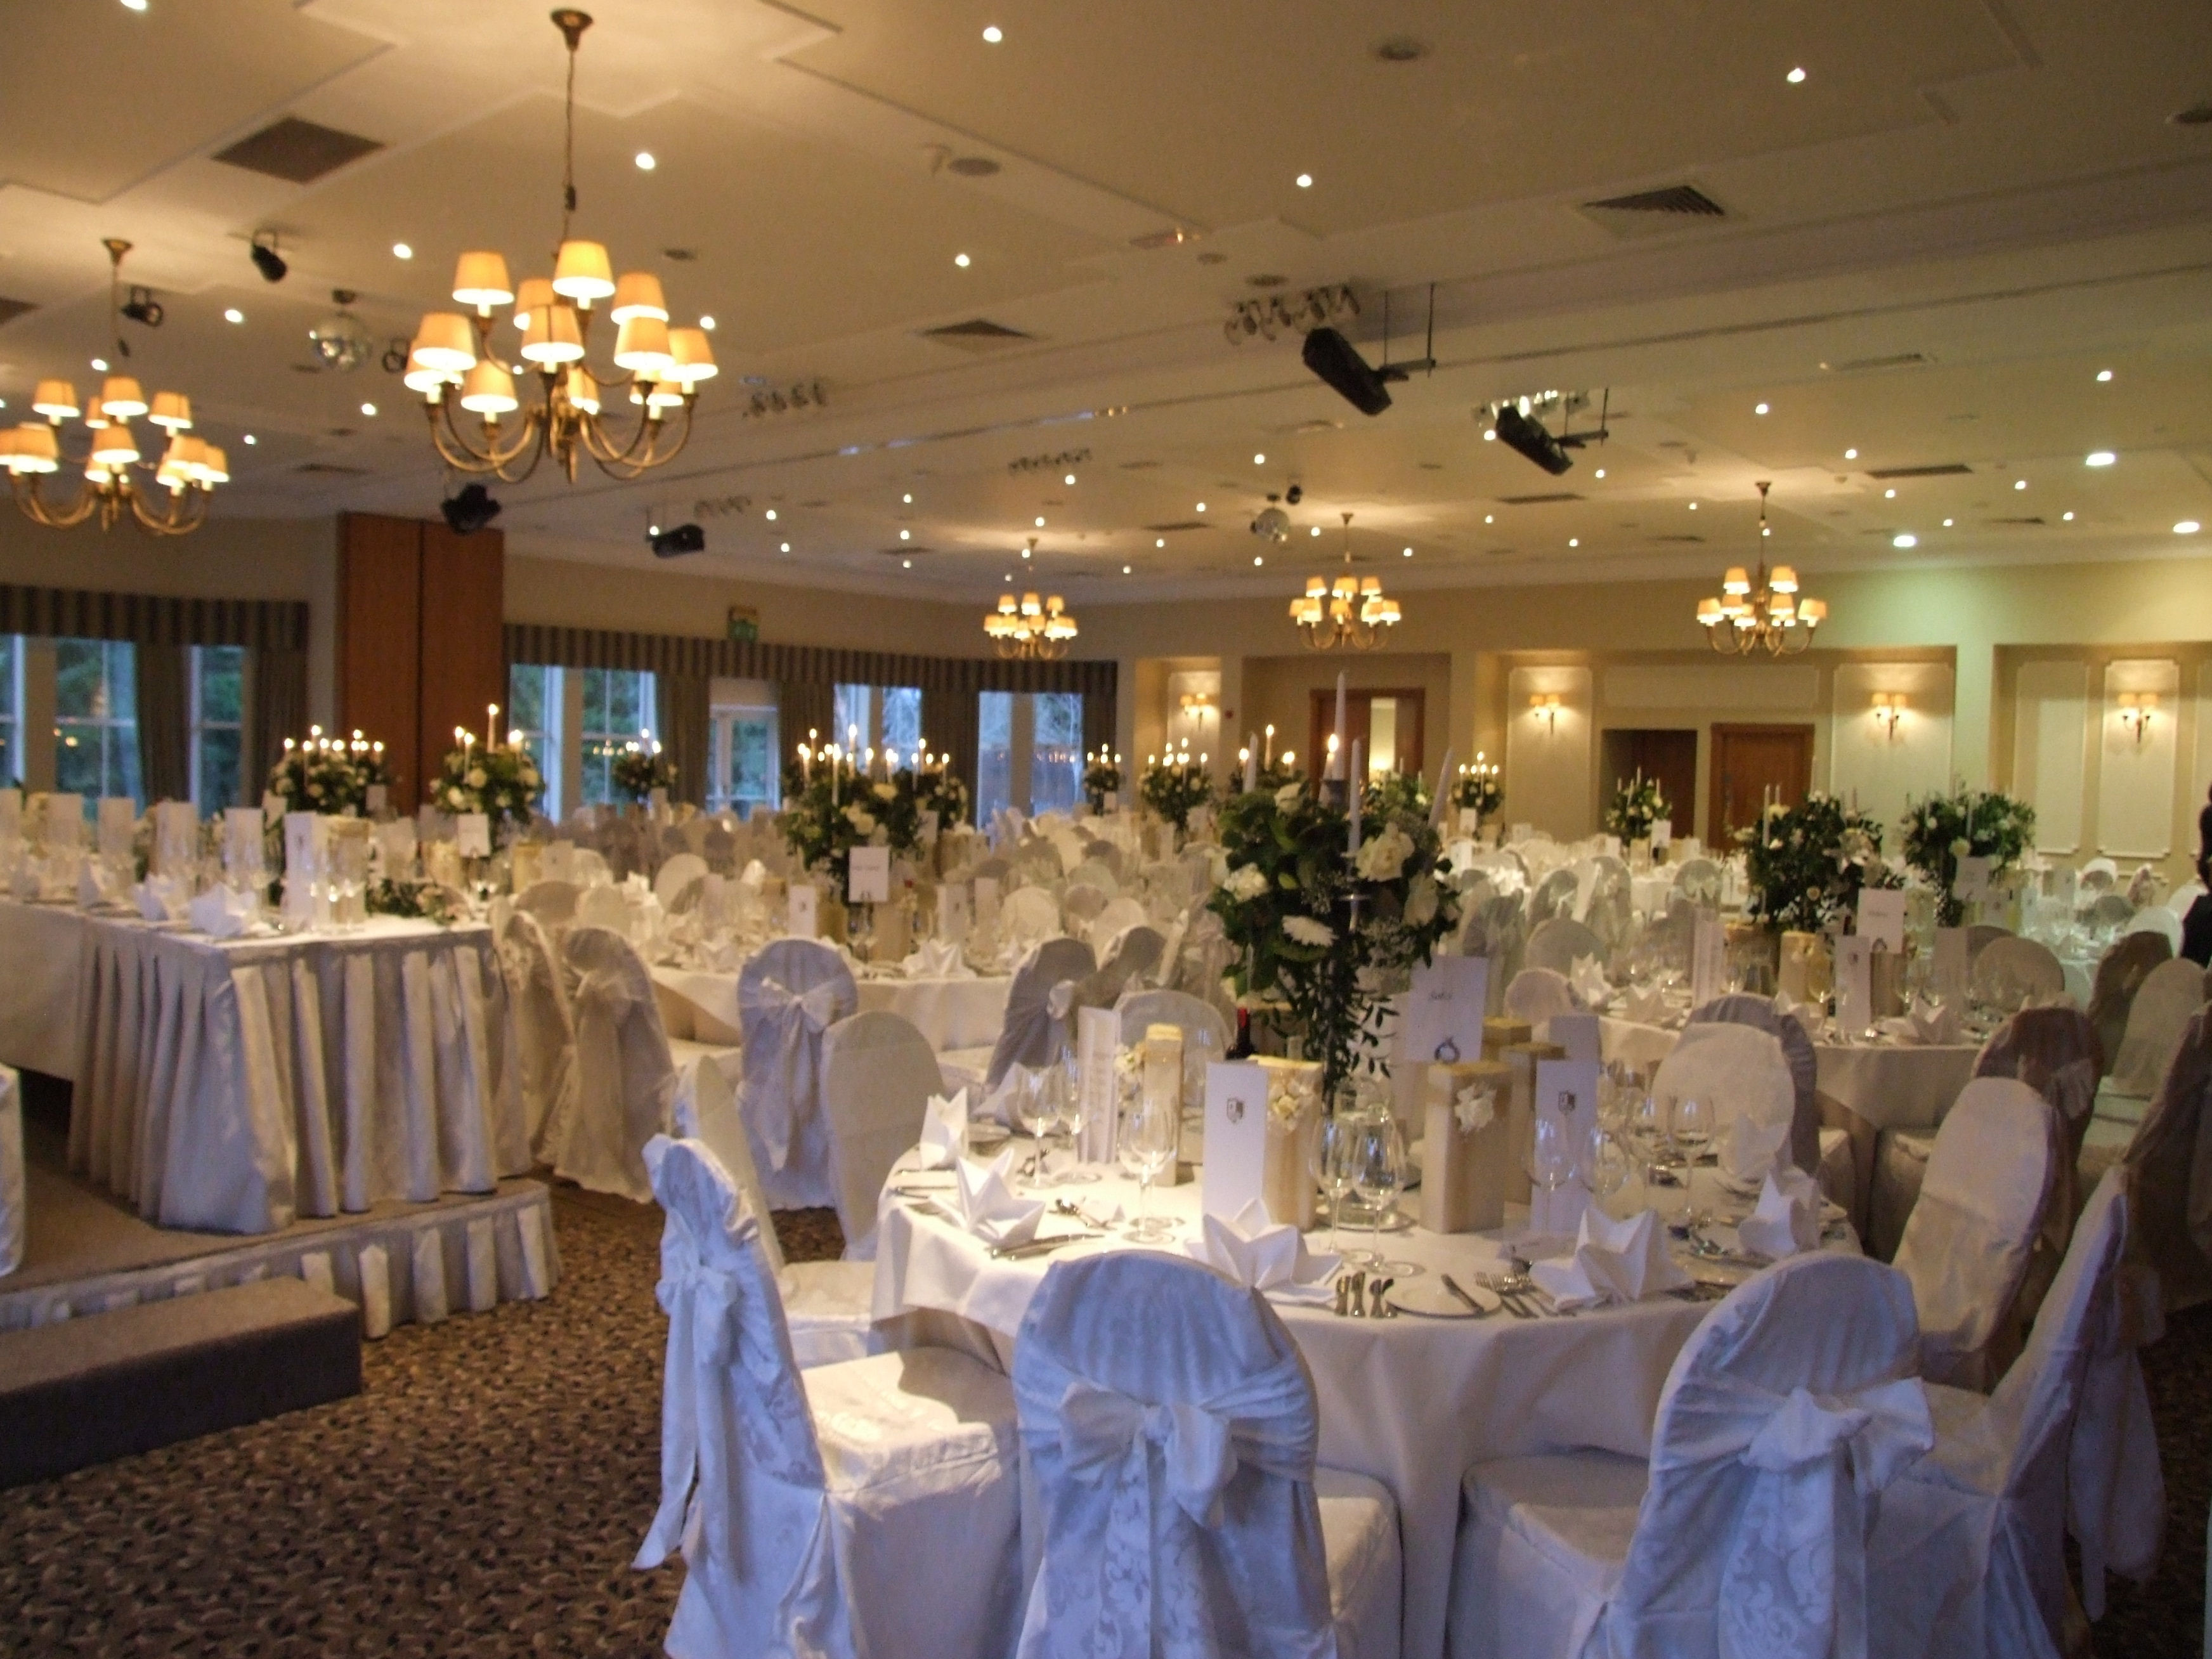 Wedding Reception Dinners  Wedding Reception Etiquette